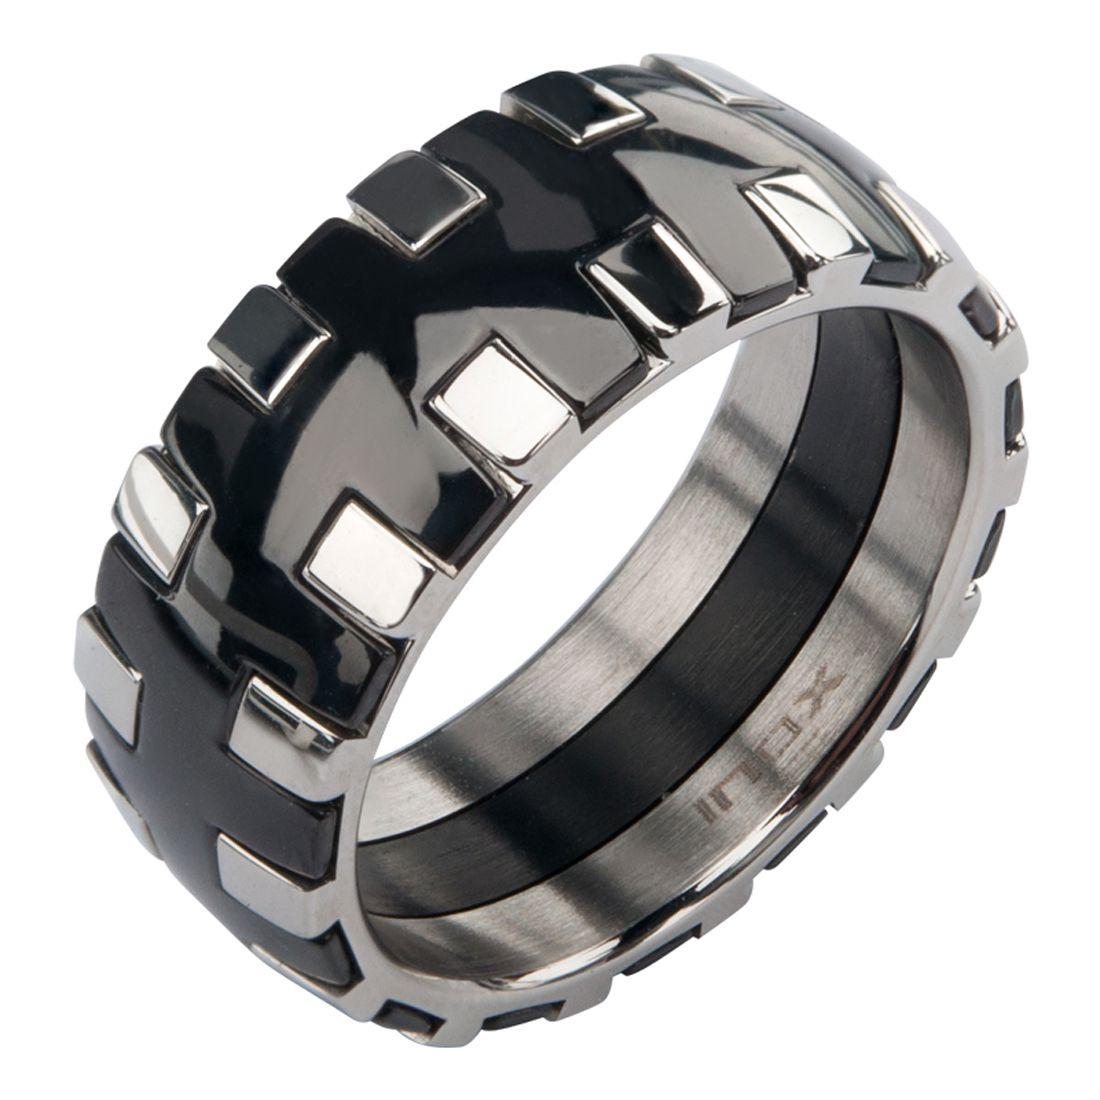 Inox Jewelry Black and Silver Stainless Steel Interlock Pattern Ring